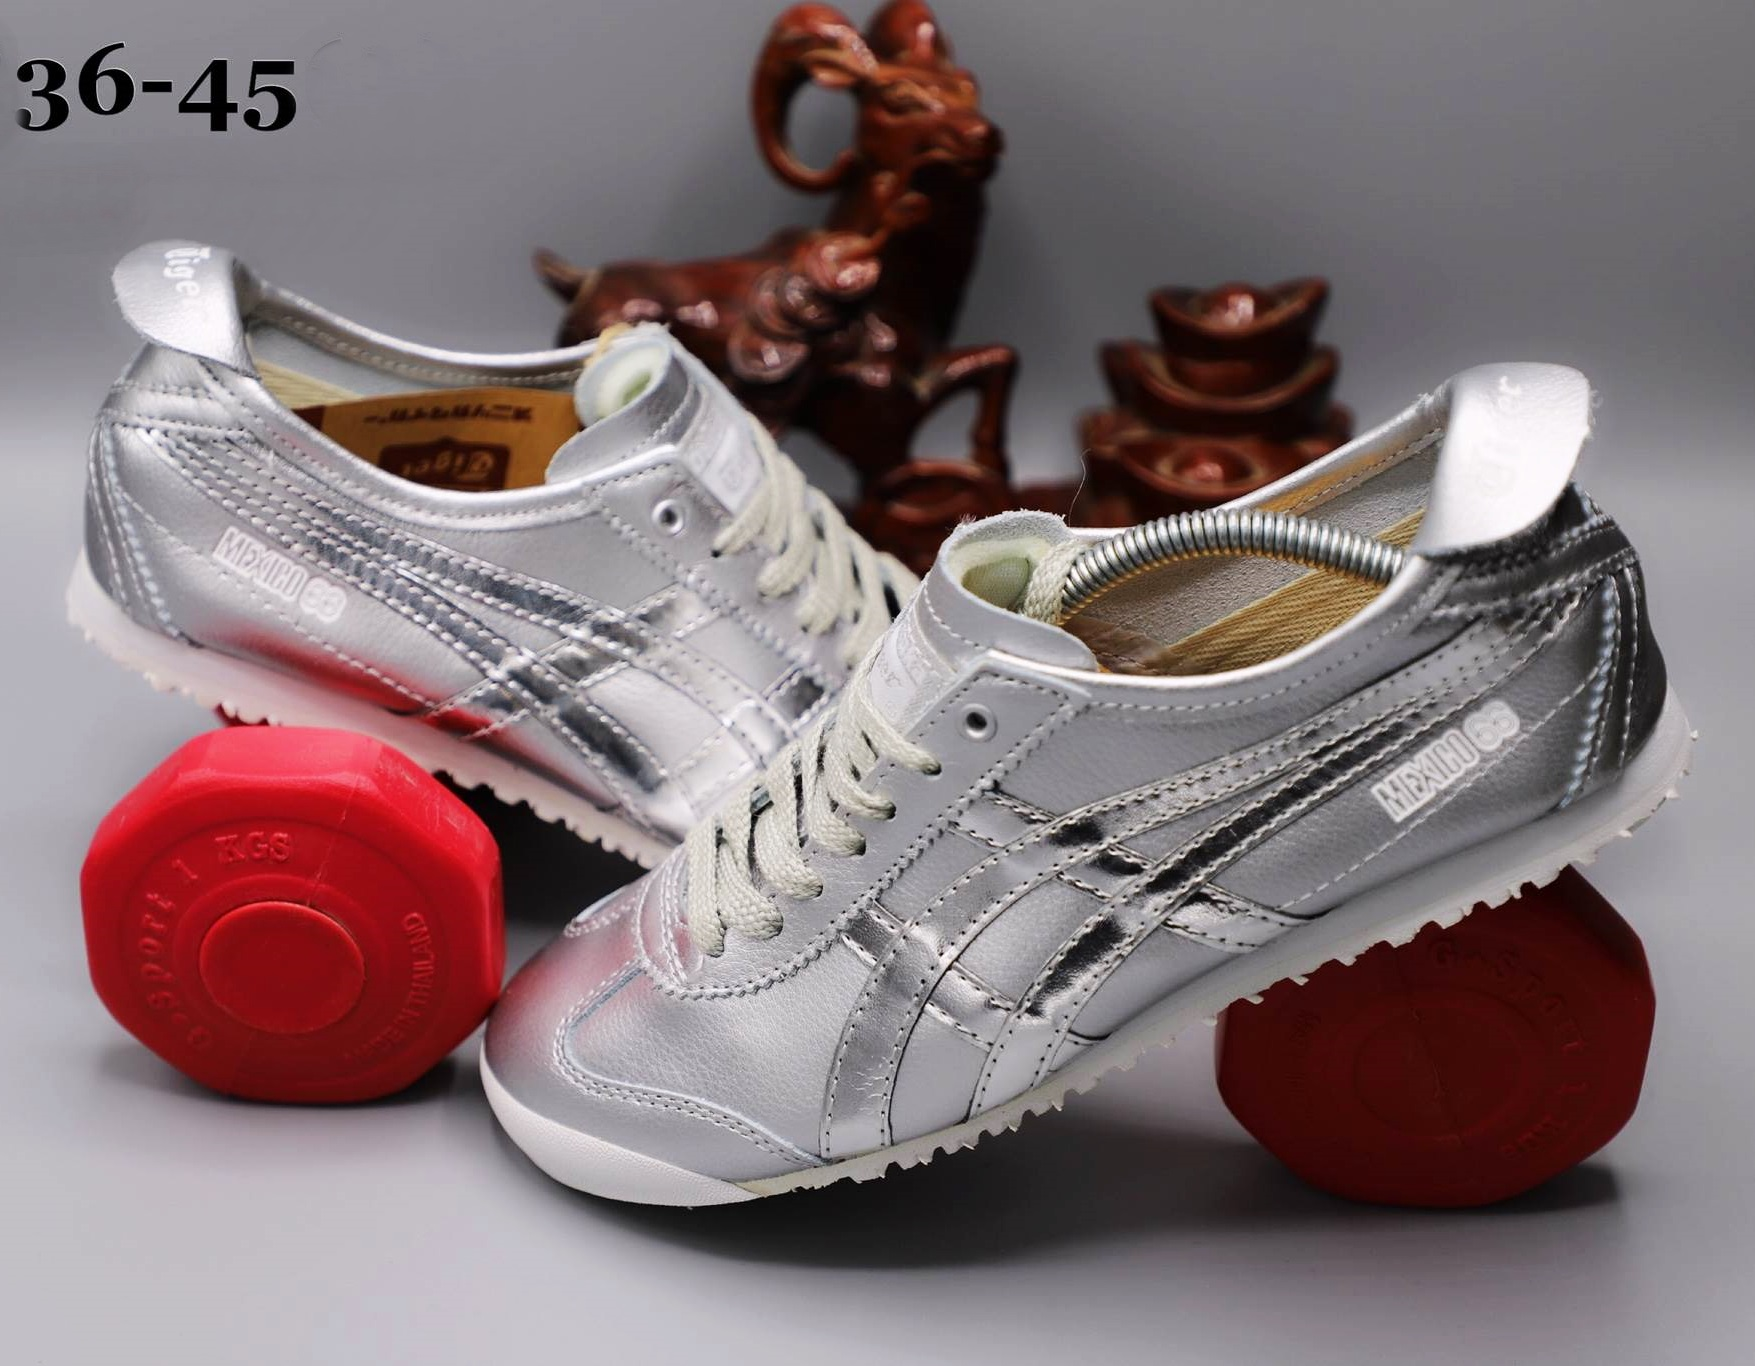 best sneakers 2cf75 a73f3 รองเท้า Onitsuka Tiger รุ่น Mexico66 เกรด3A หนังแท้ size 36-45